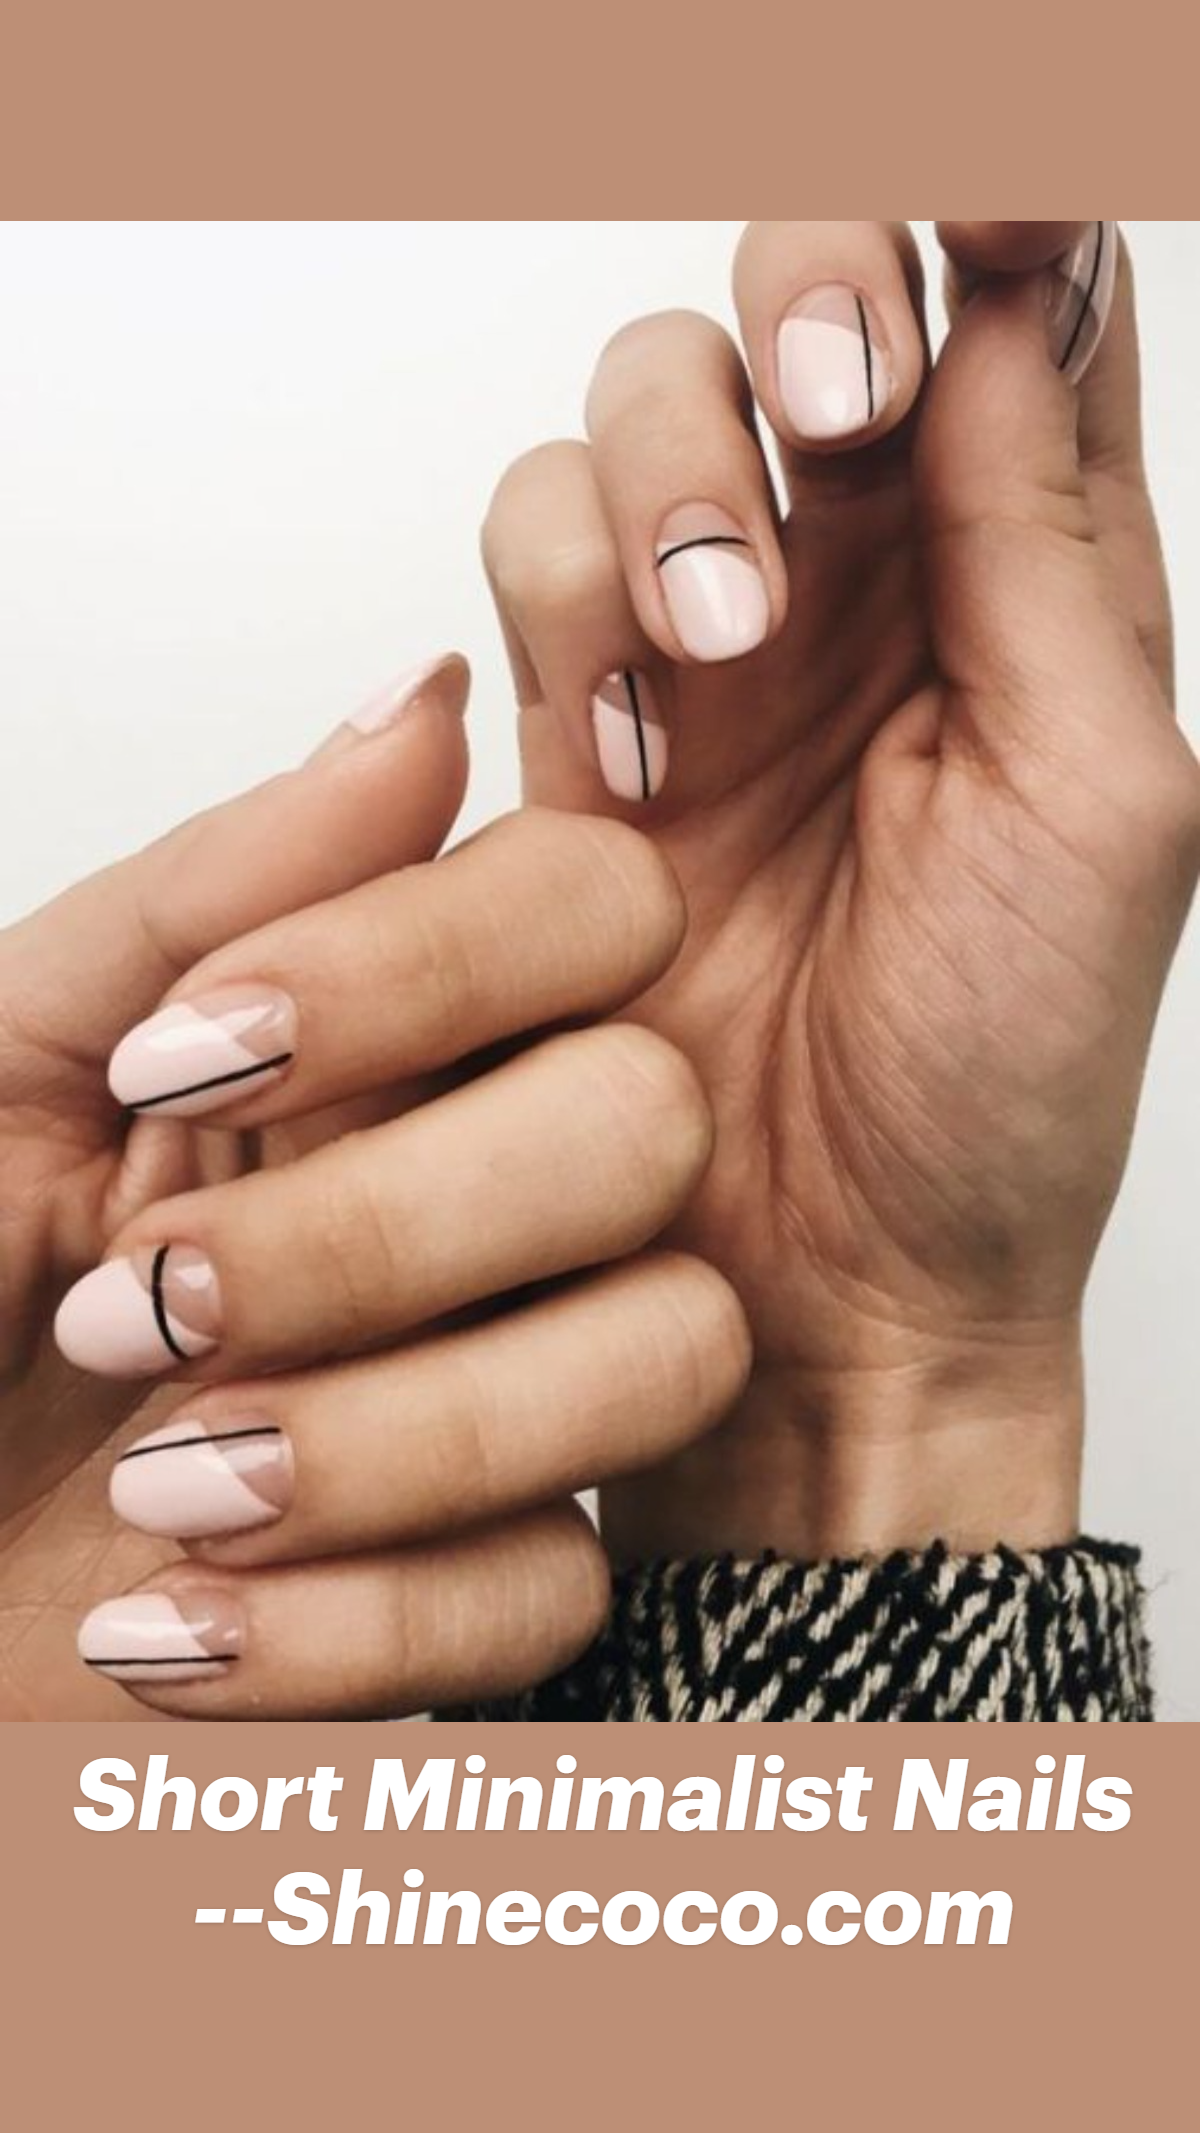 Short Minimalist Nails –Shinecoco.com